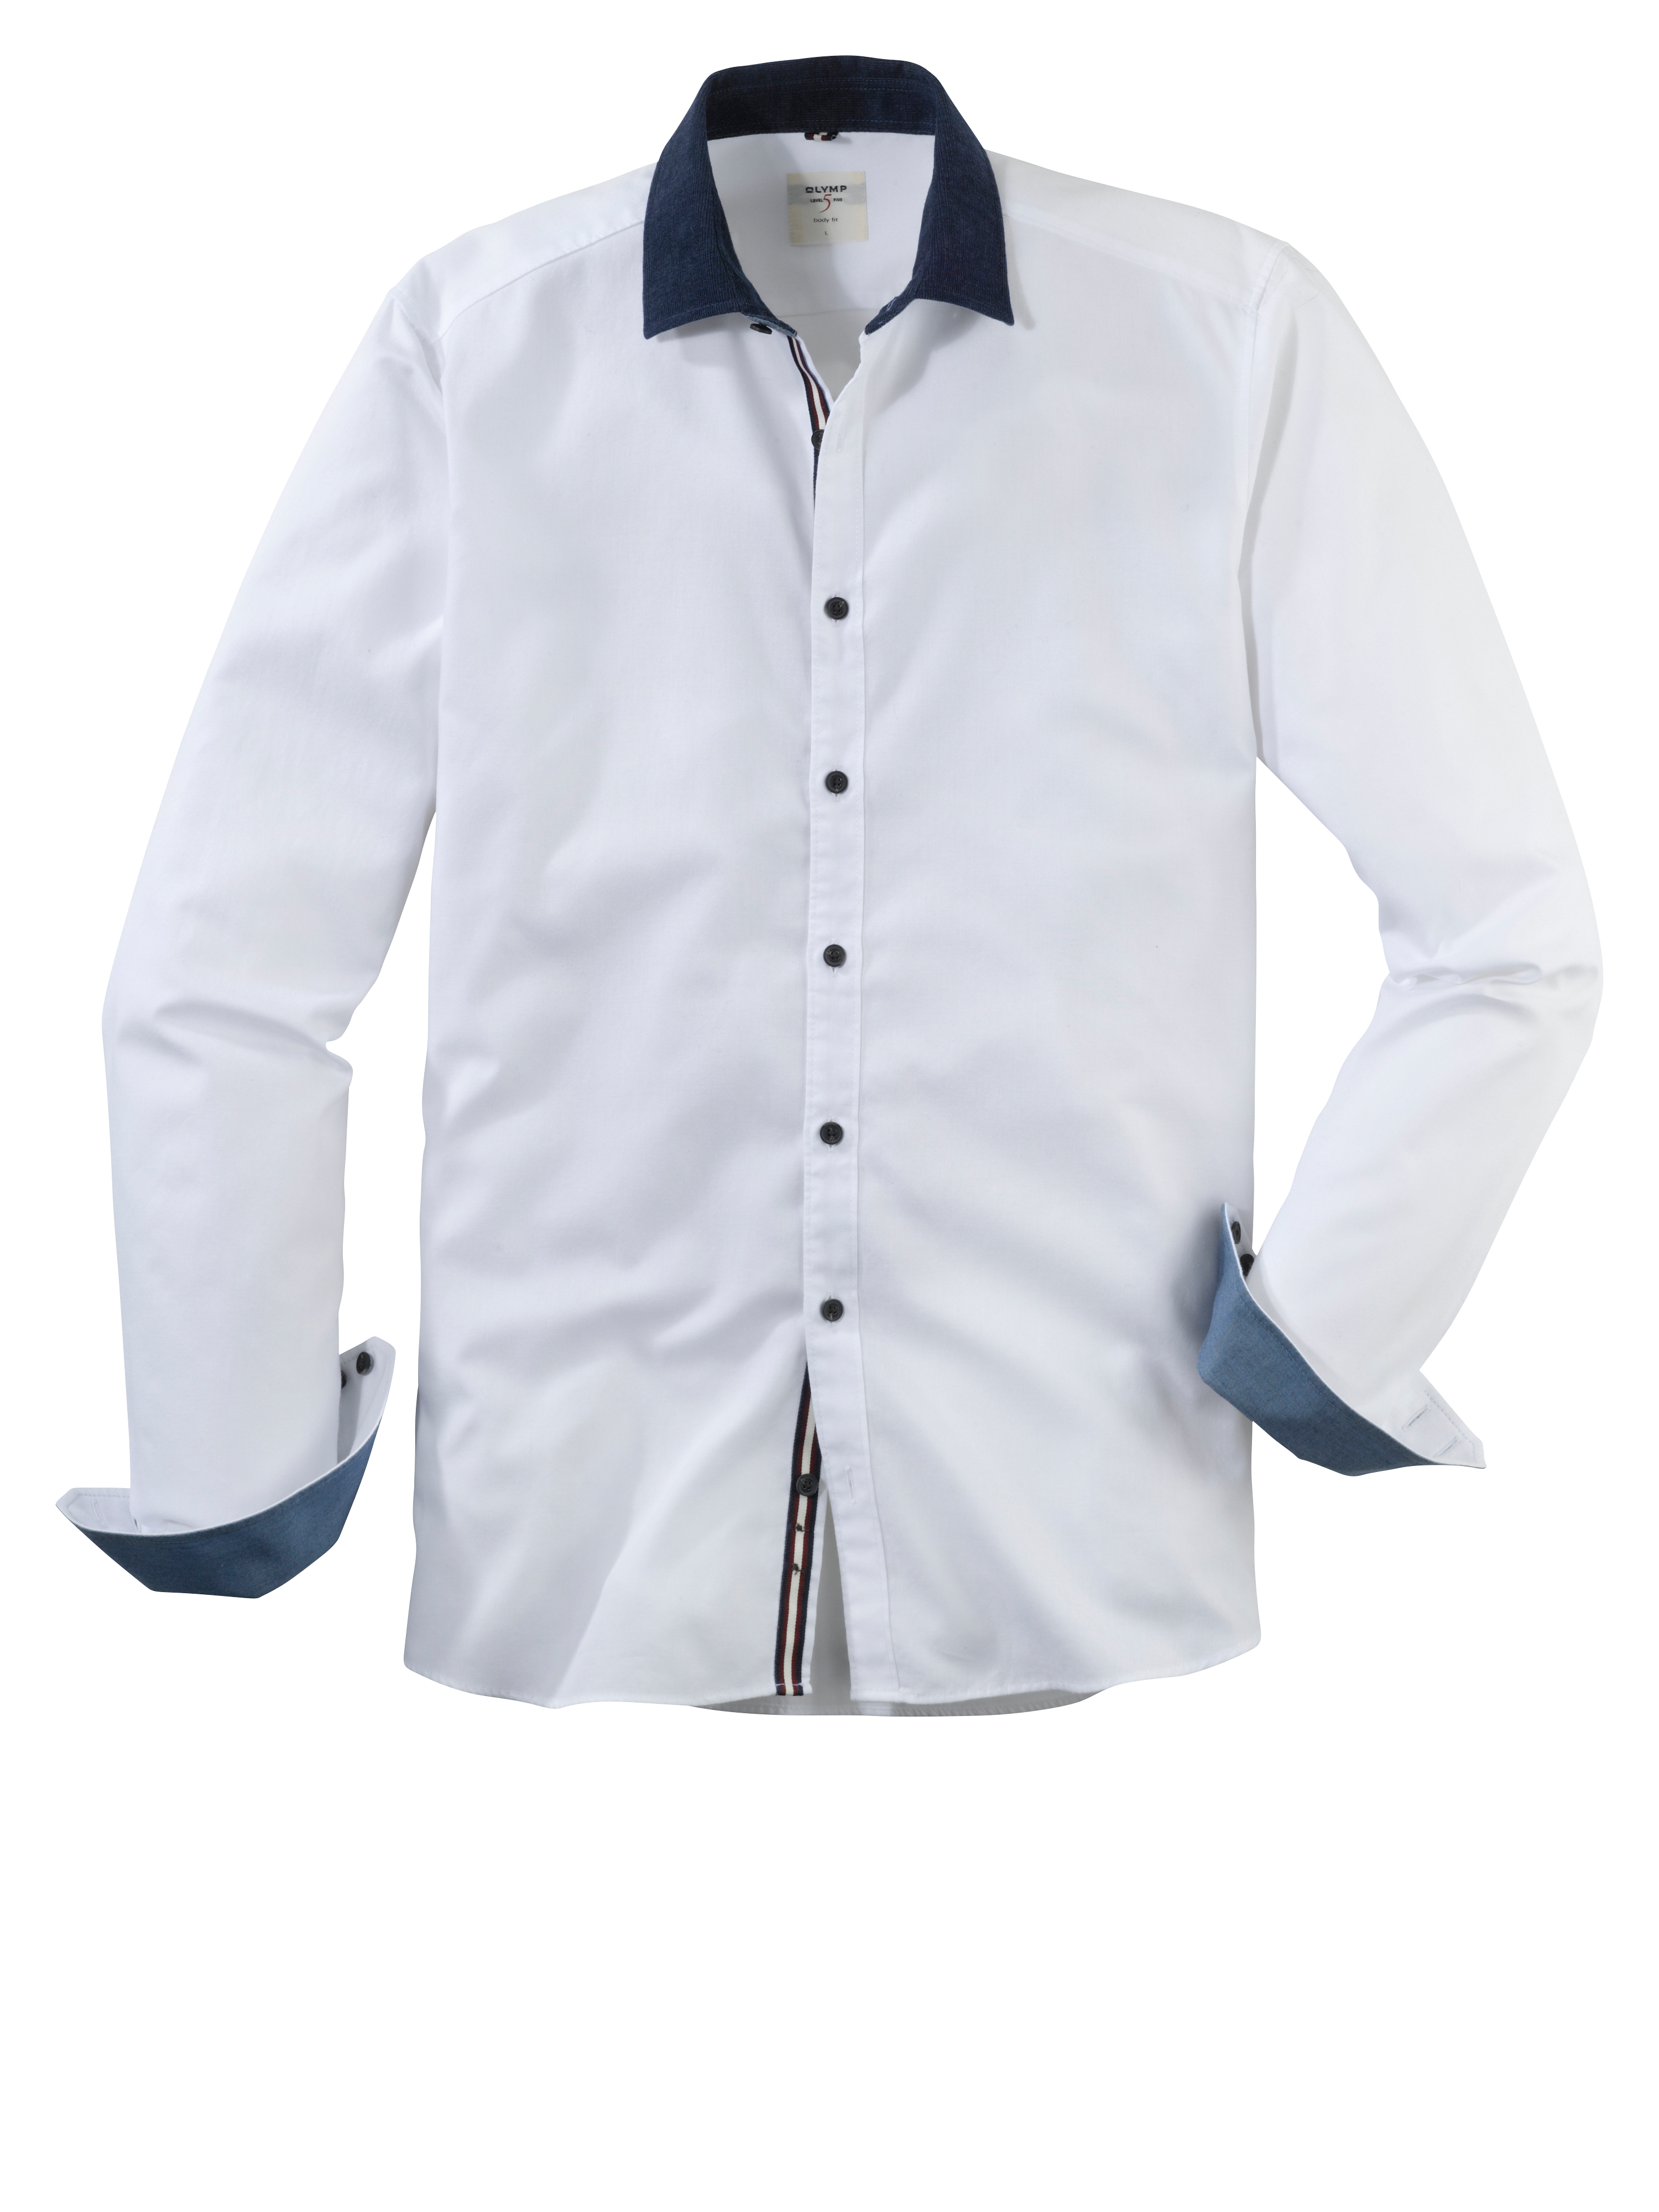 OLYMP Level Five Casual Hemd, body fit, Kent, Weiß, M | Bekleidung > Hemden > Sonstige Hemden | OLYMP